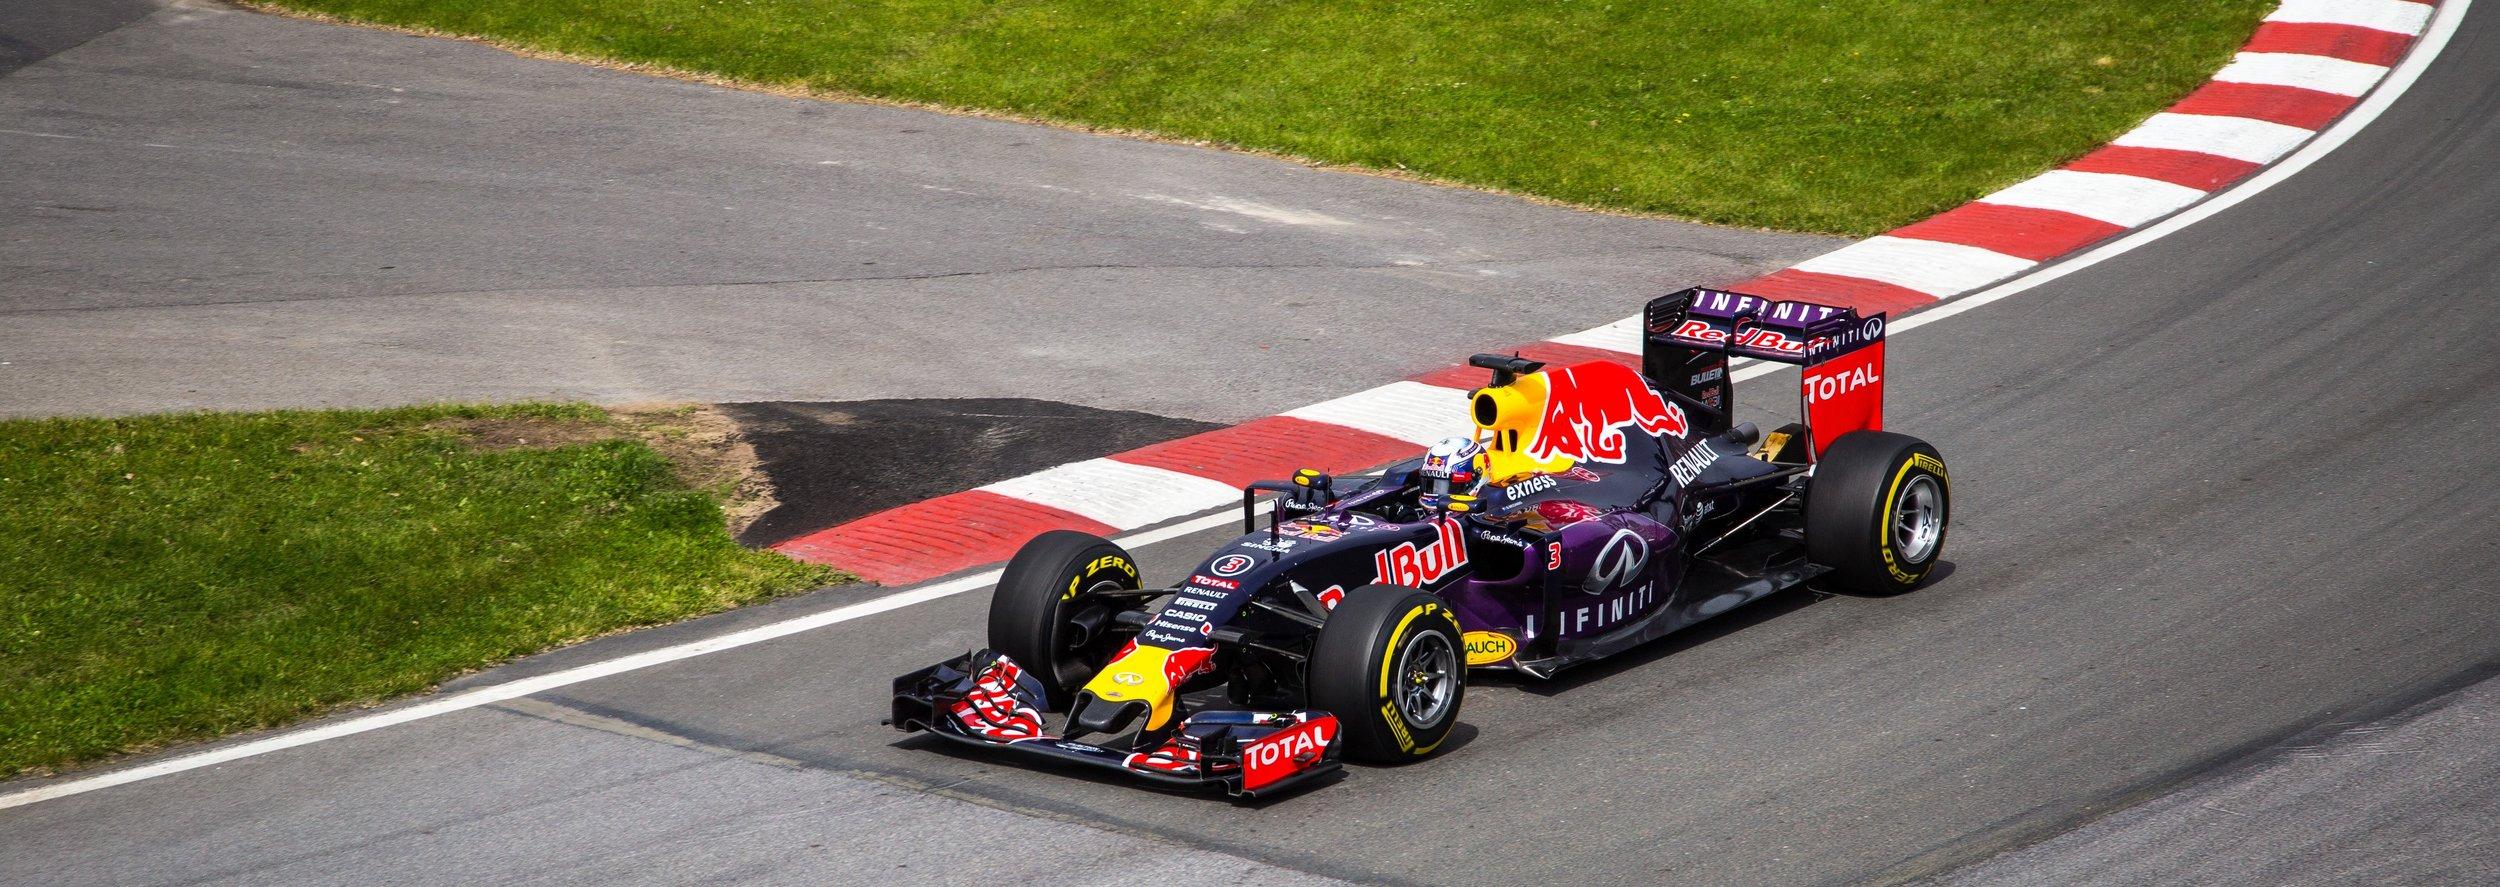 F1 Grand Prix Singapore.jpg